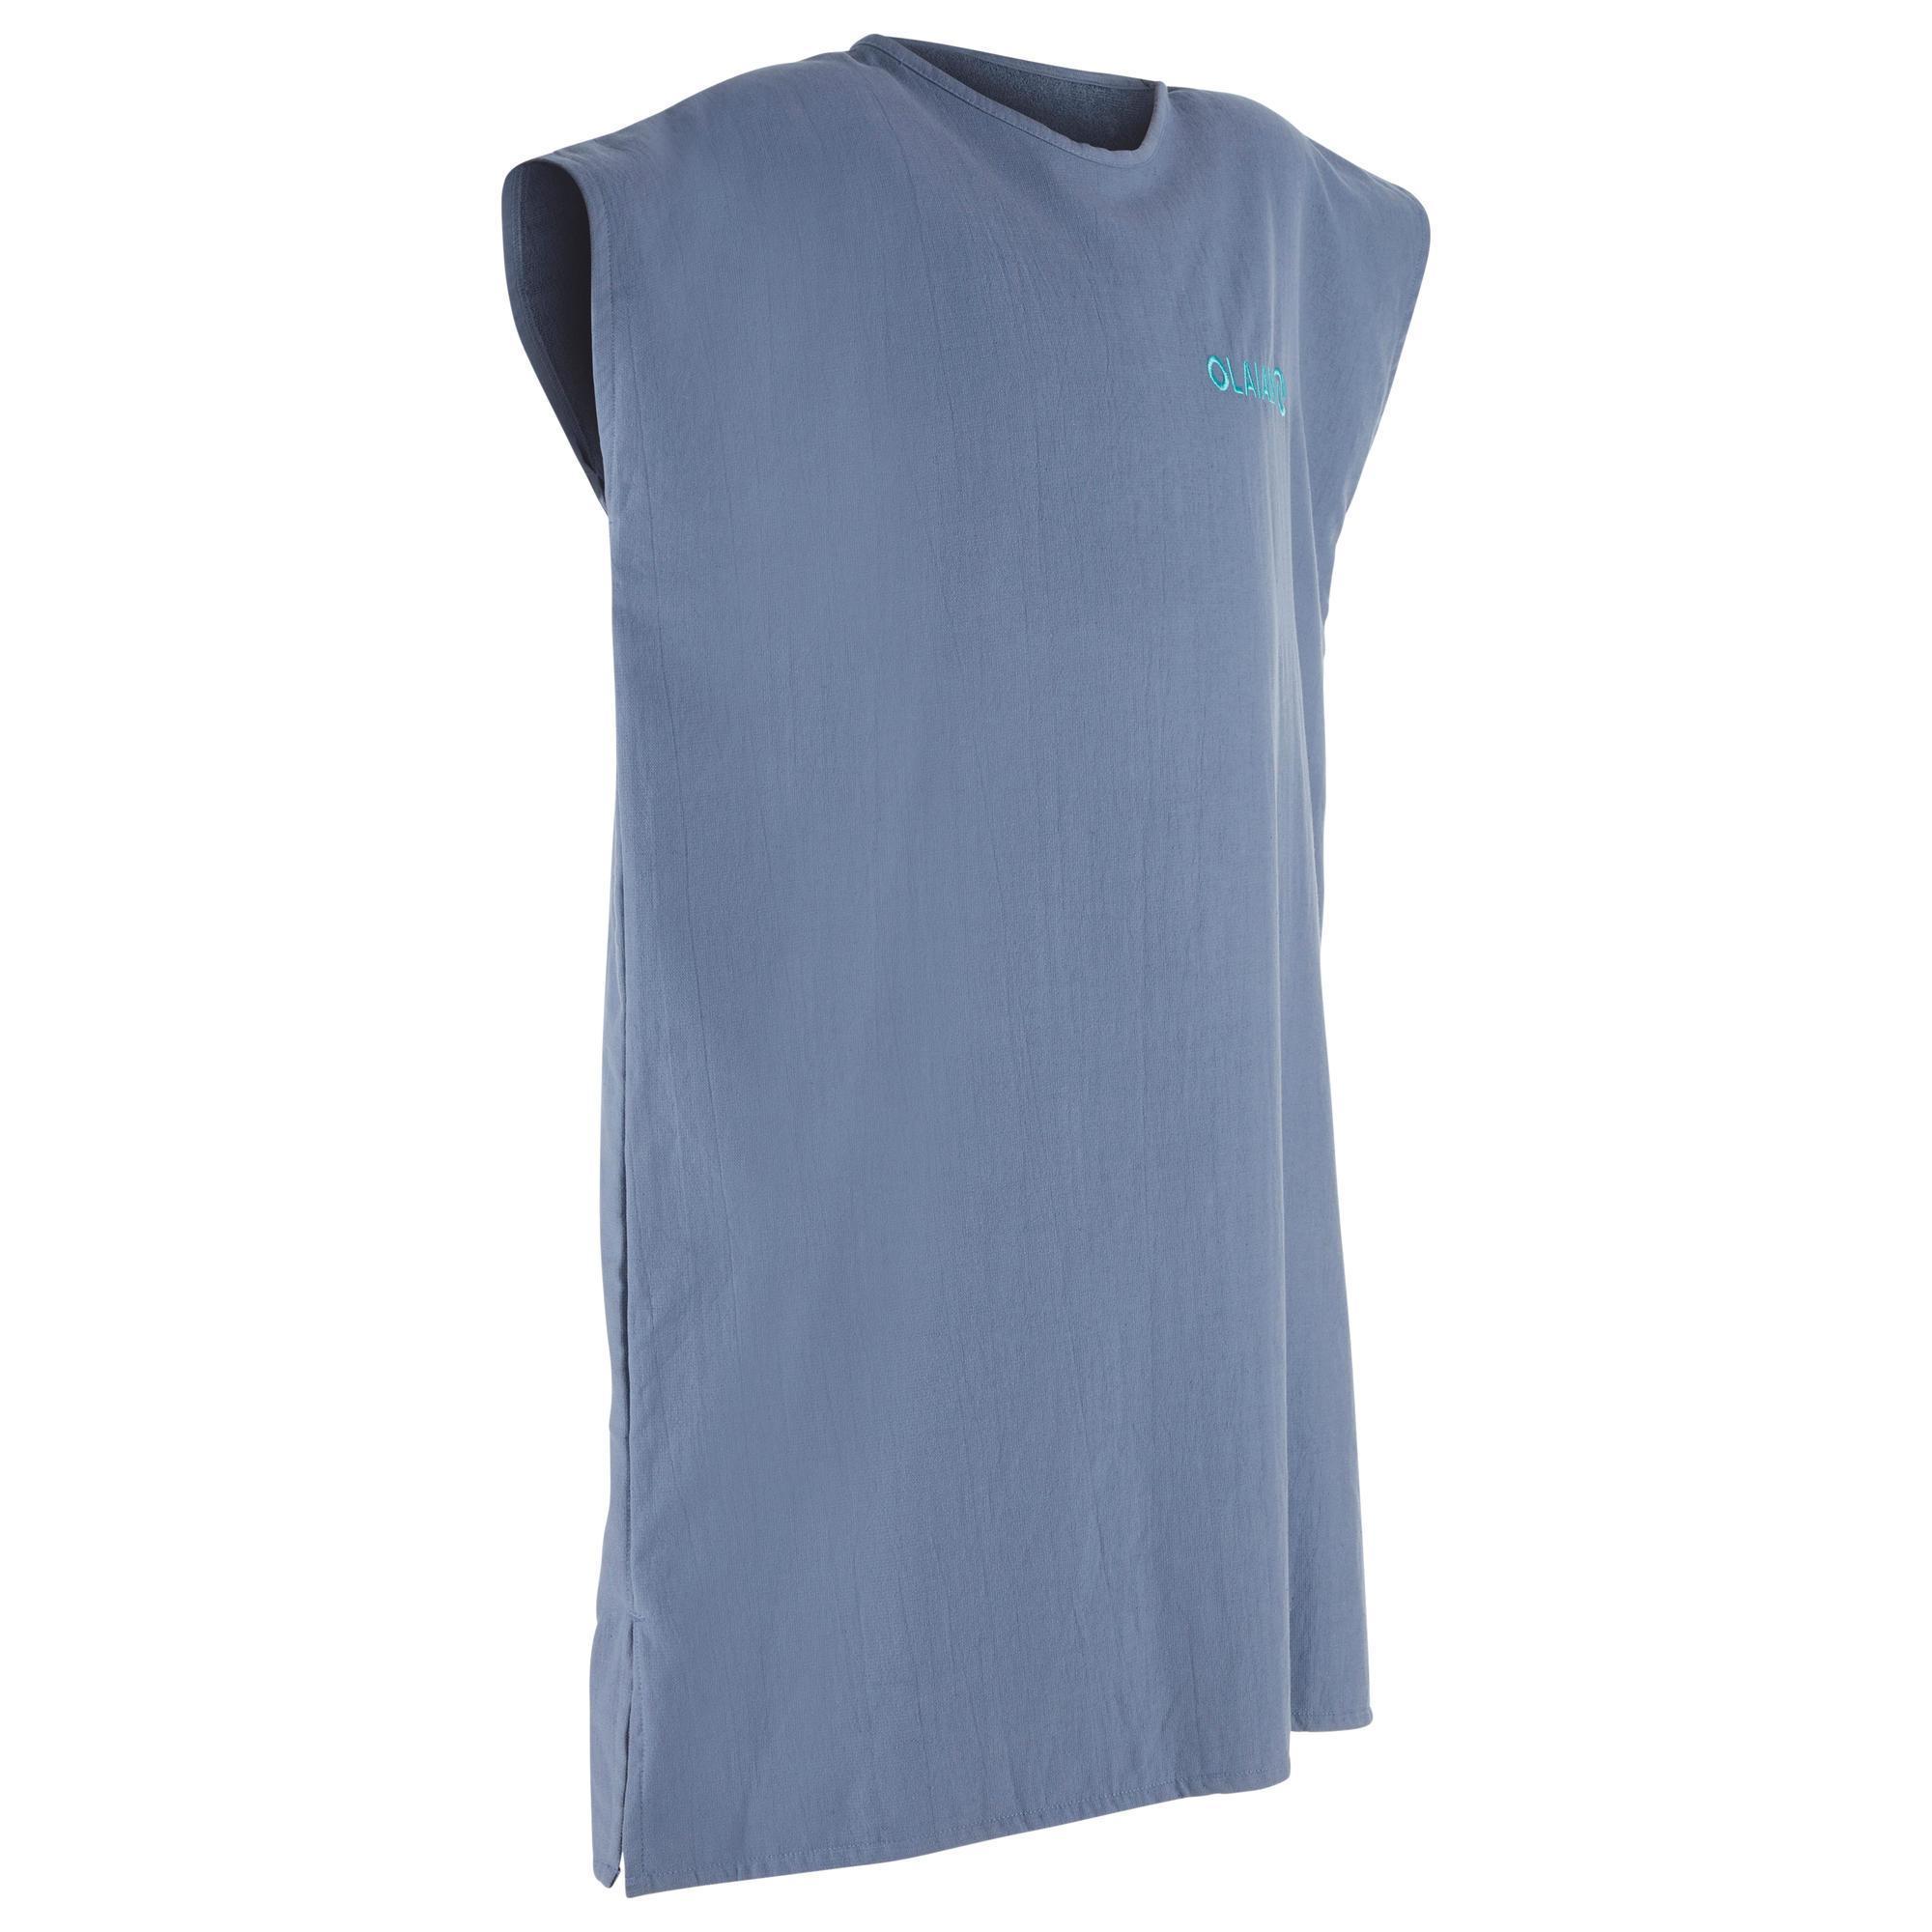 Surf-Poncho 100 Erwachsene blau | Bekleidung > Pullover > Ponchos & Capes | Grau - Blau | Olaian